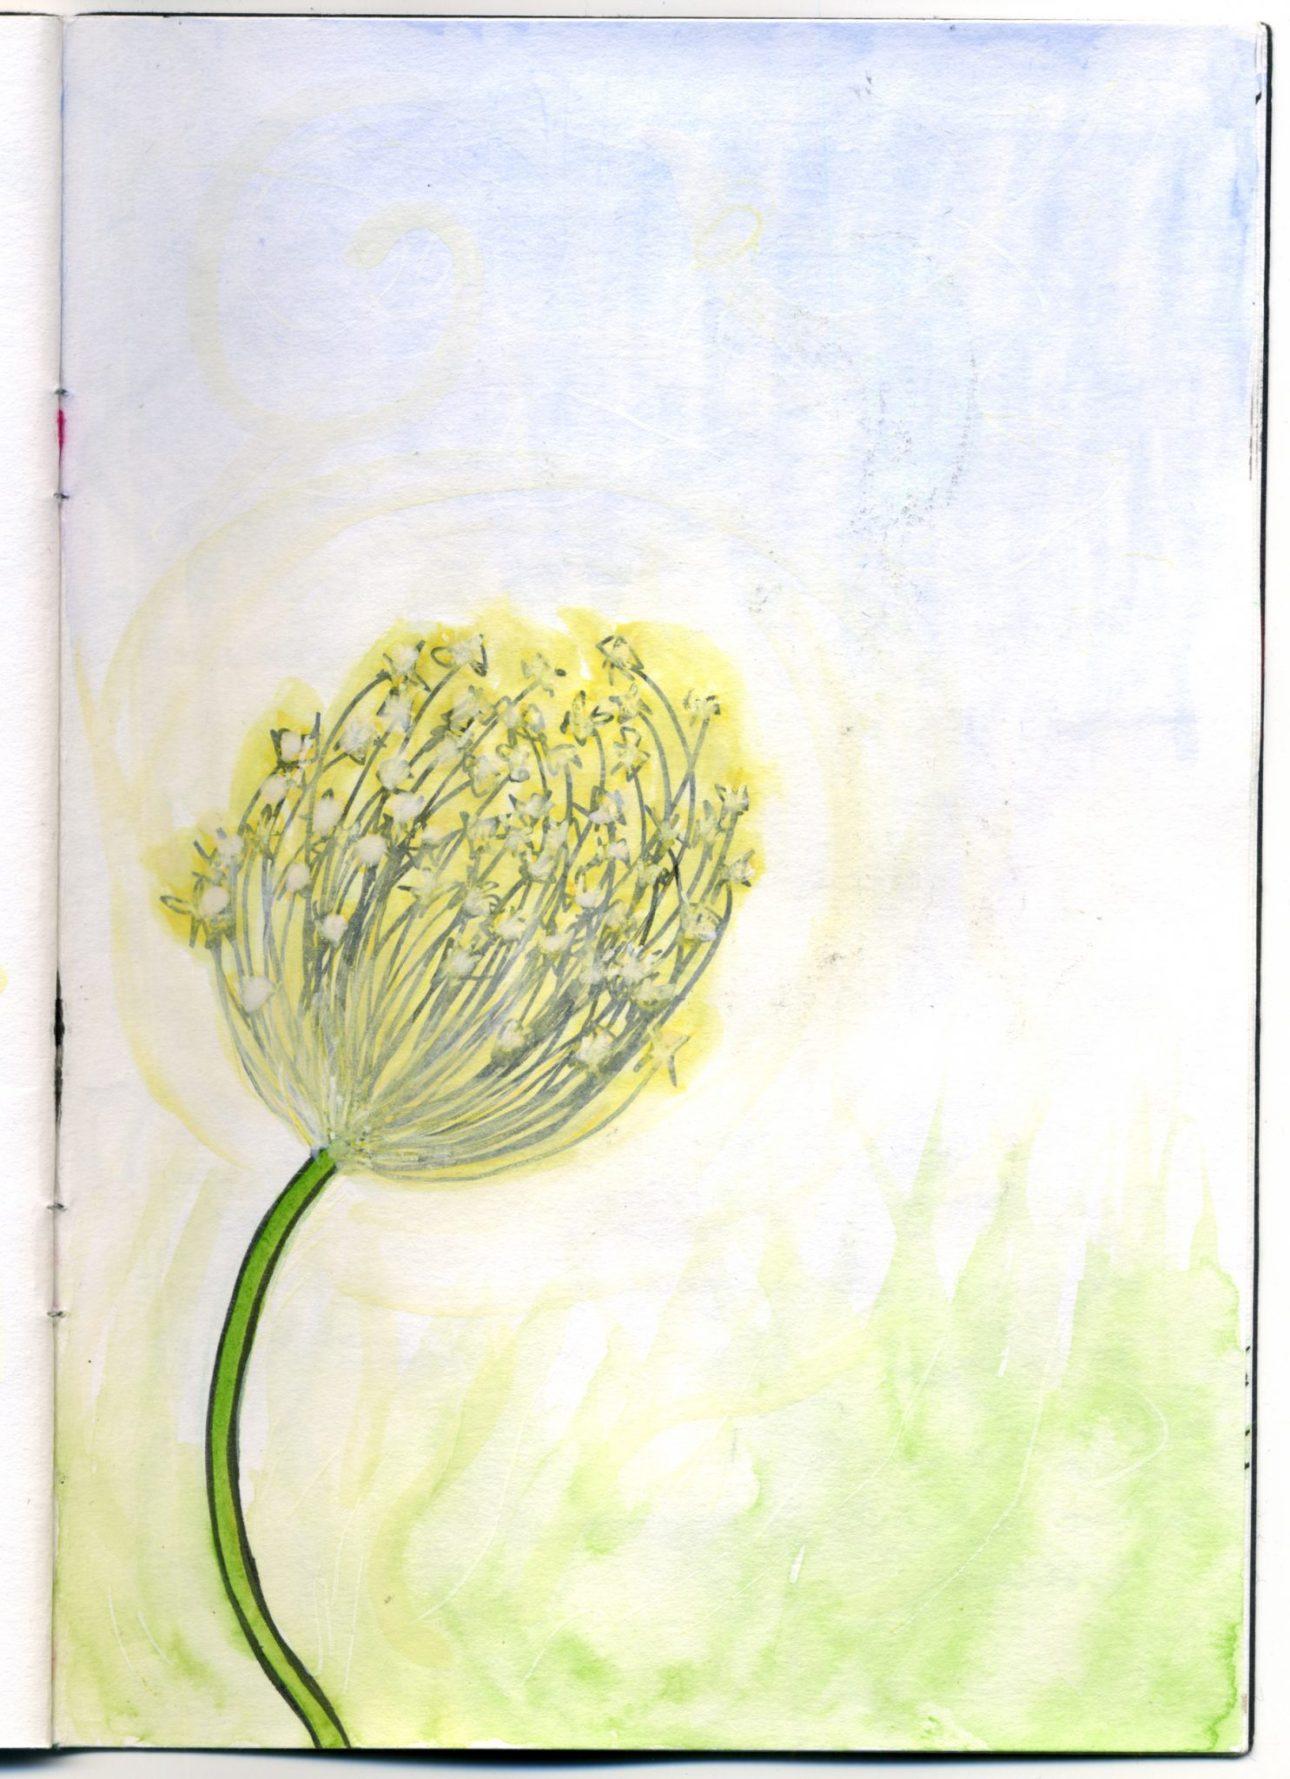 A watercolour sketch of a dandelion.